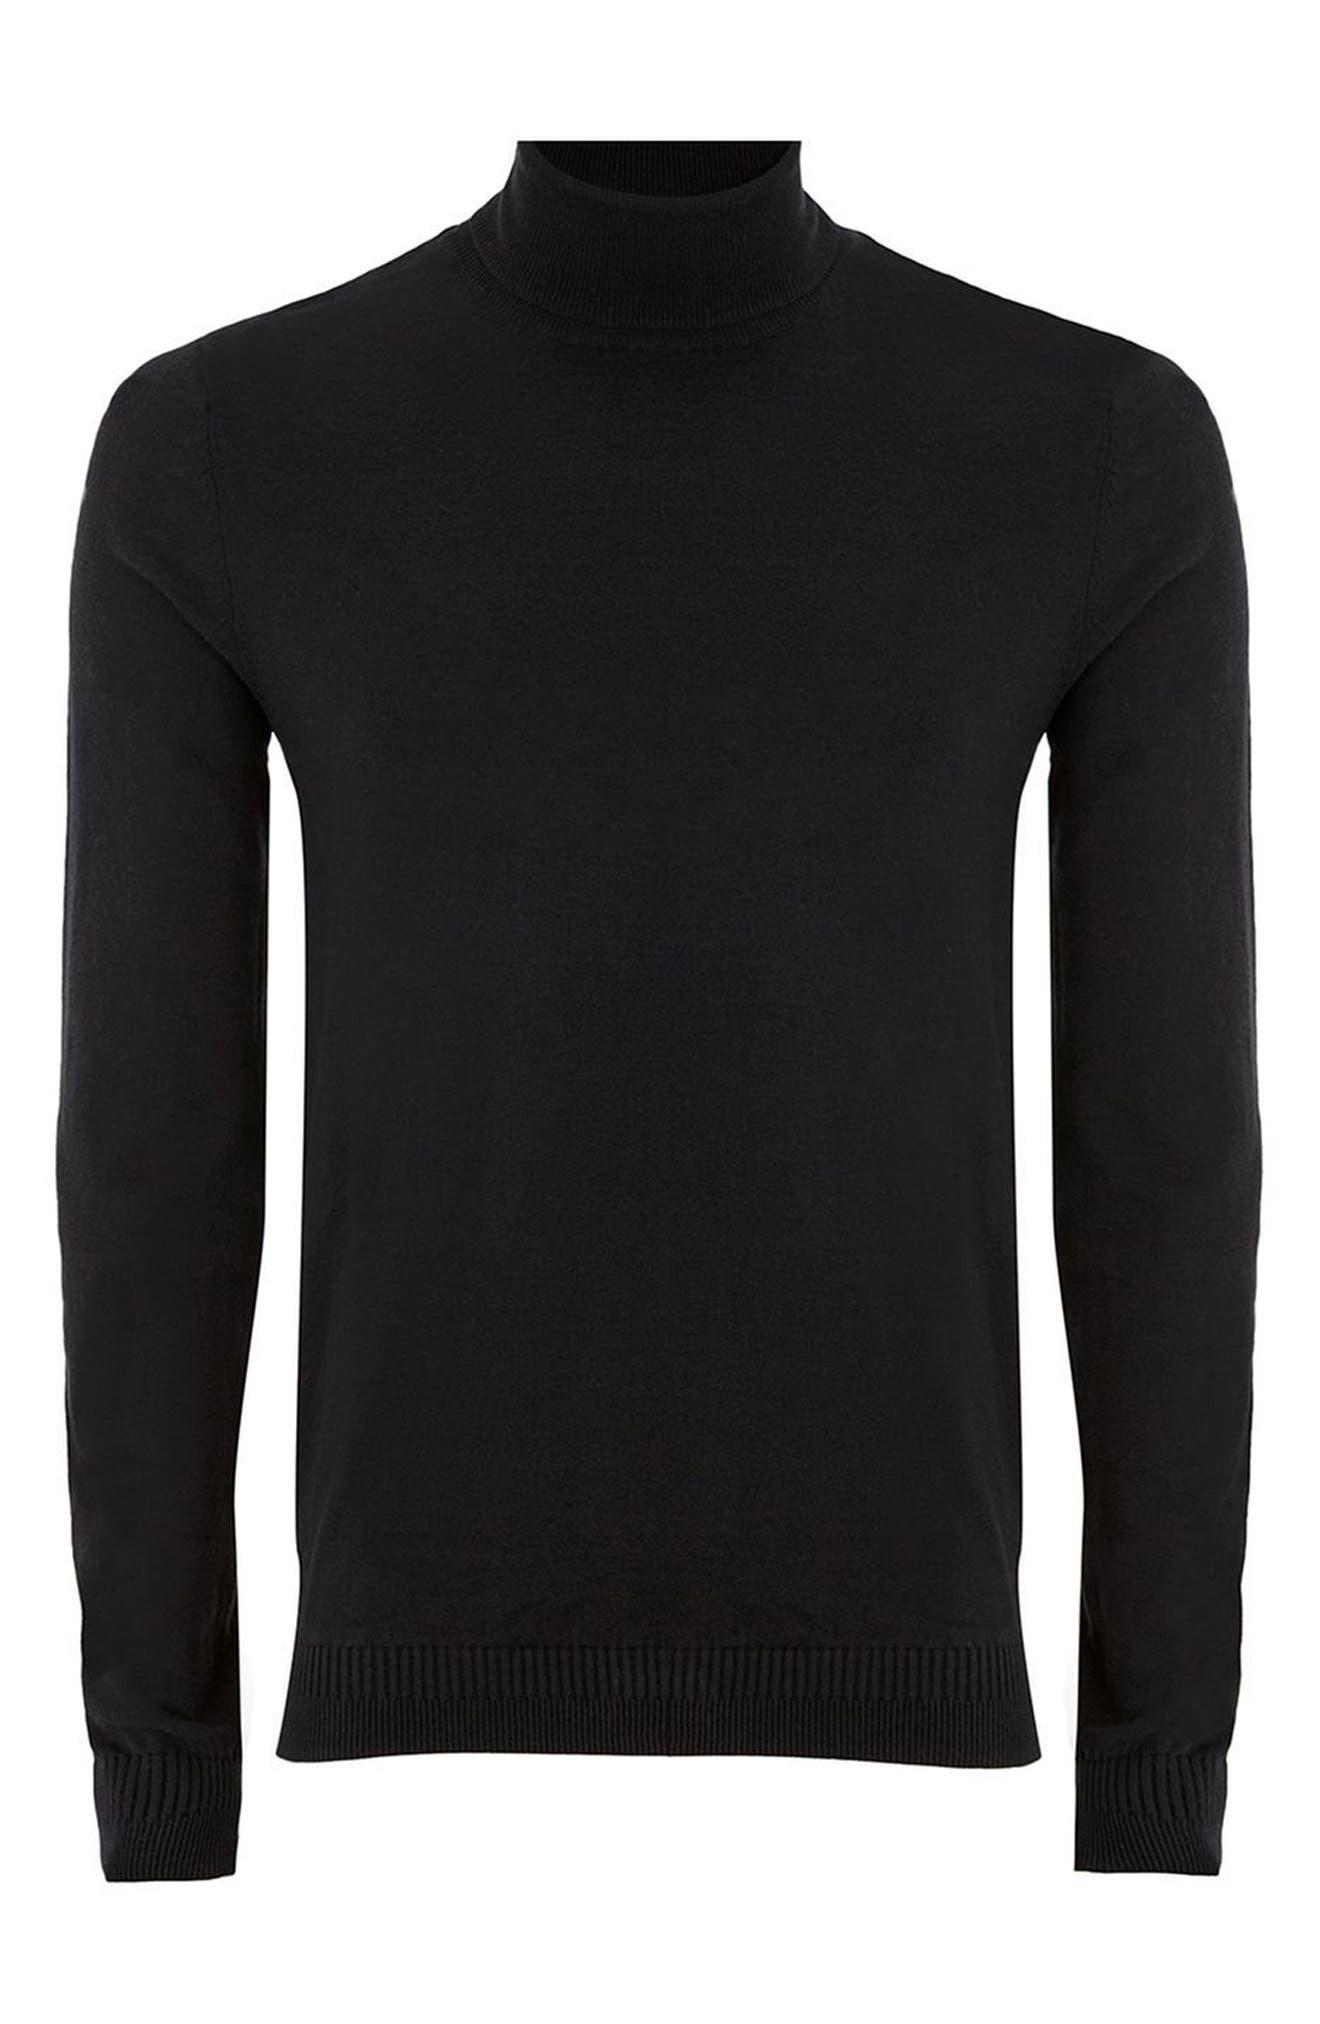 Cotton Turtleneck Sweater,                             Alternate thumbnail 4, color,                             001